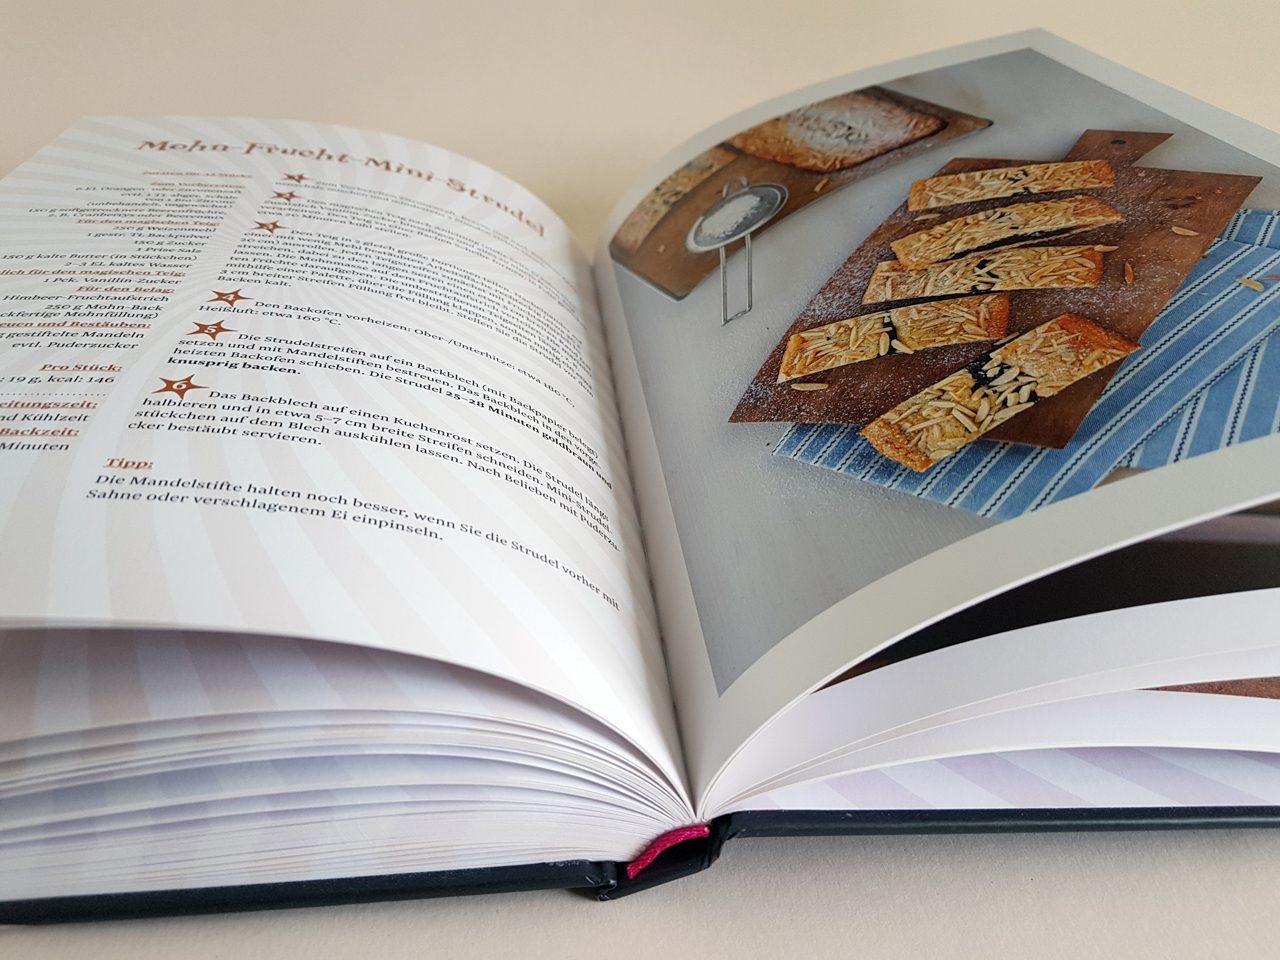 1 magischer Teig 100 Rezeptideen Dr. Oetker Verlag aufgeschlagenes Backbuch